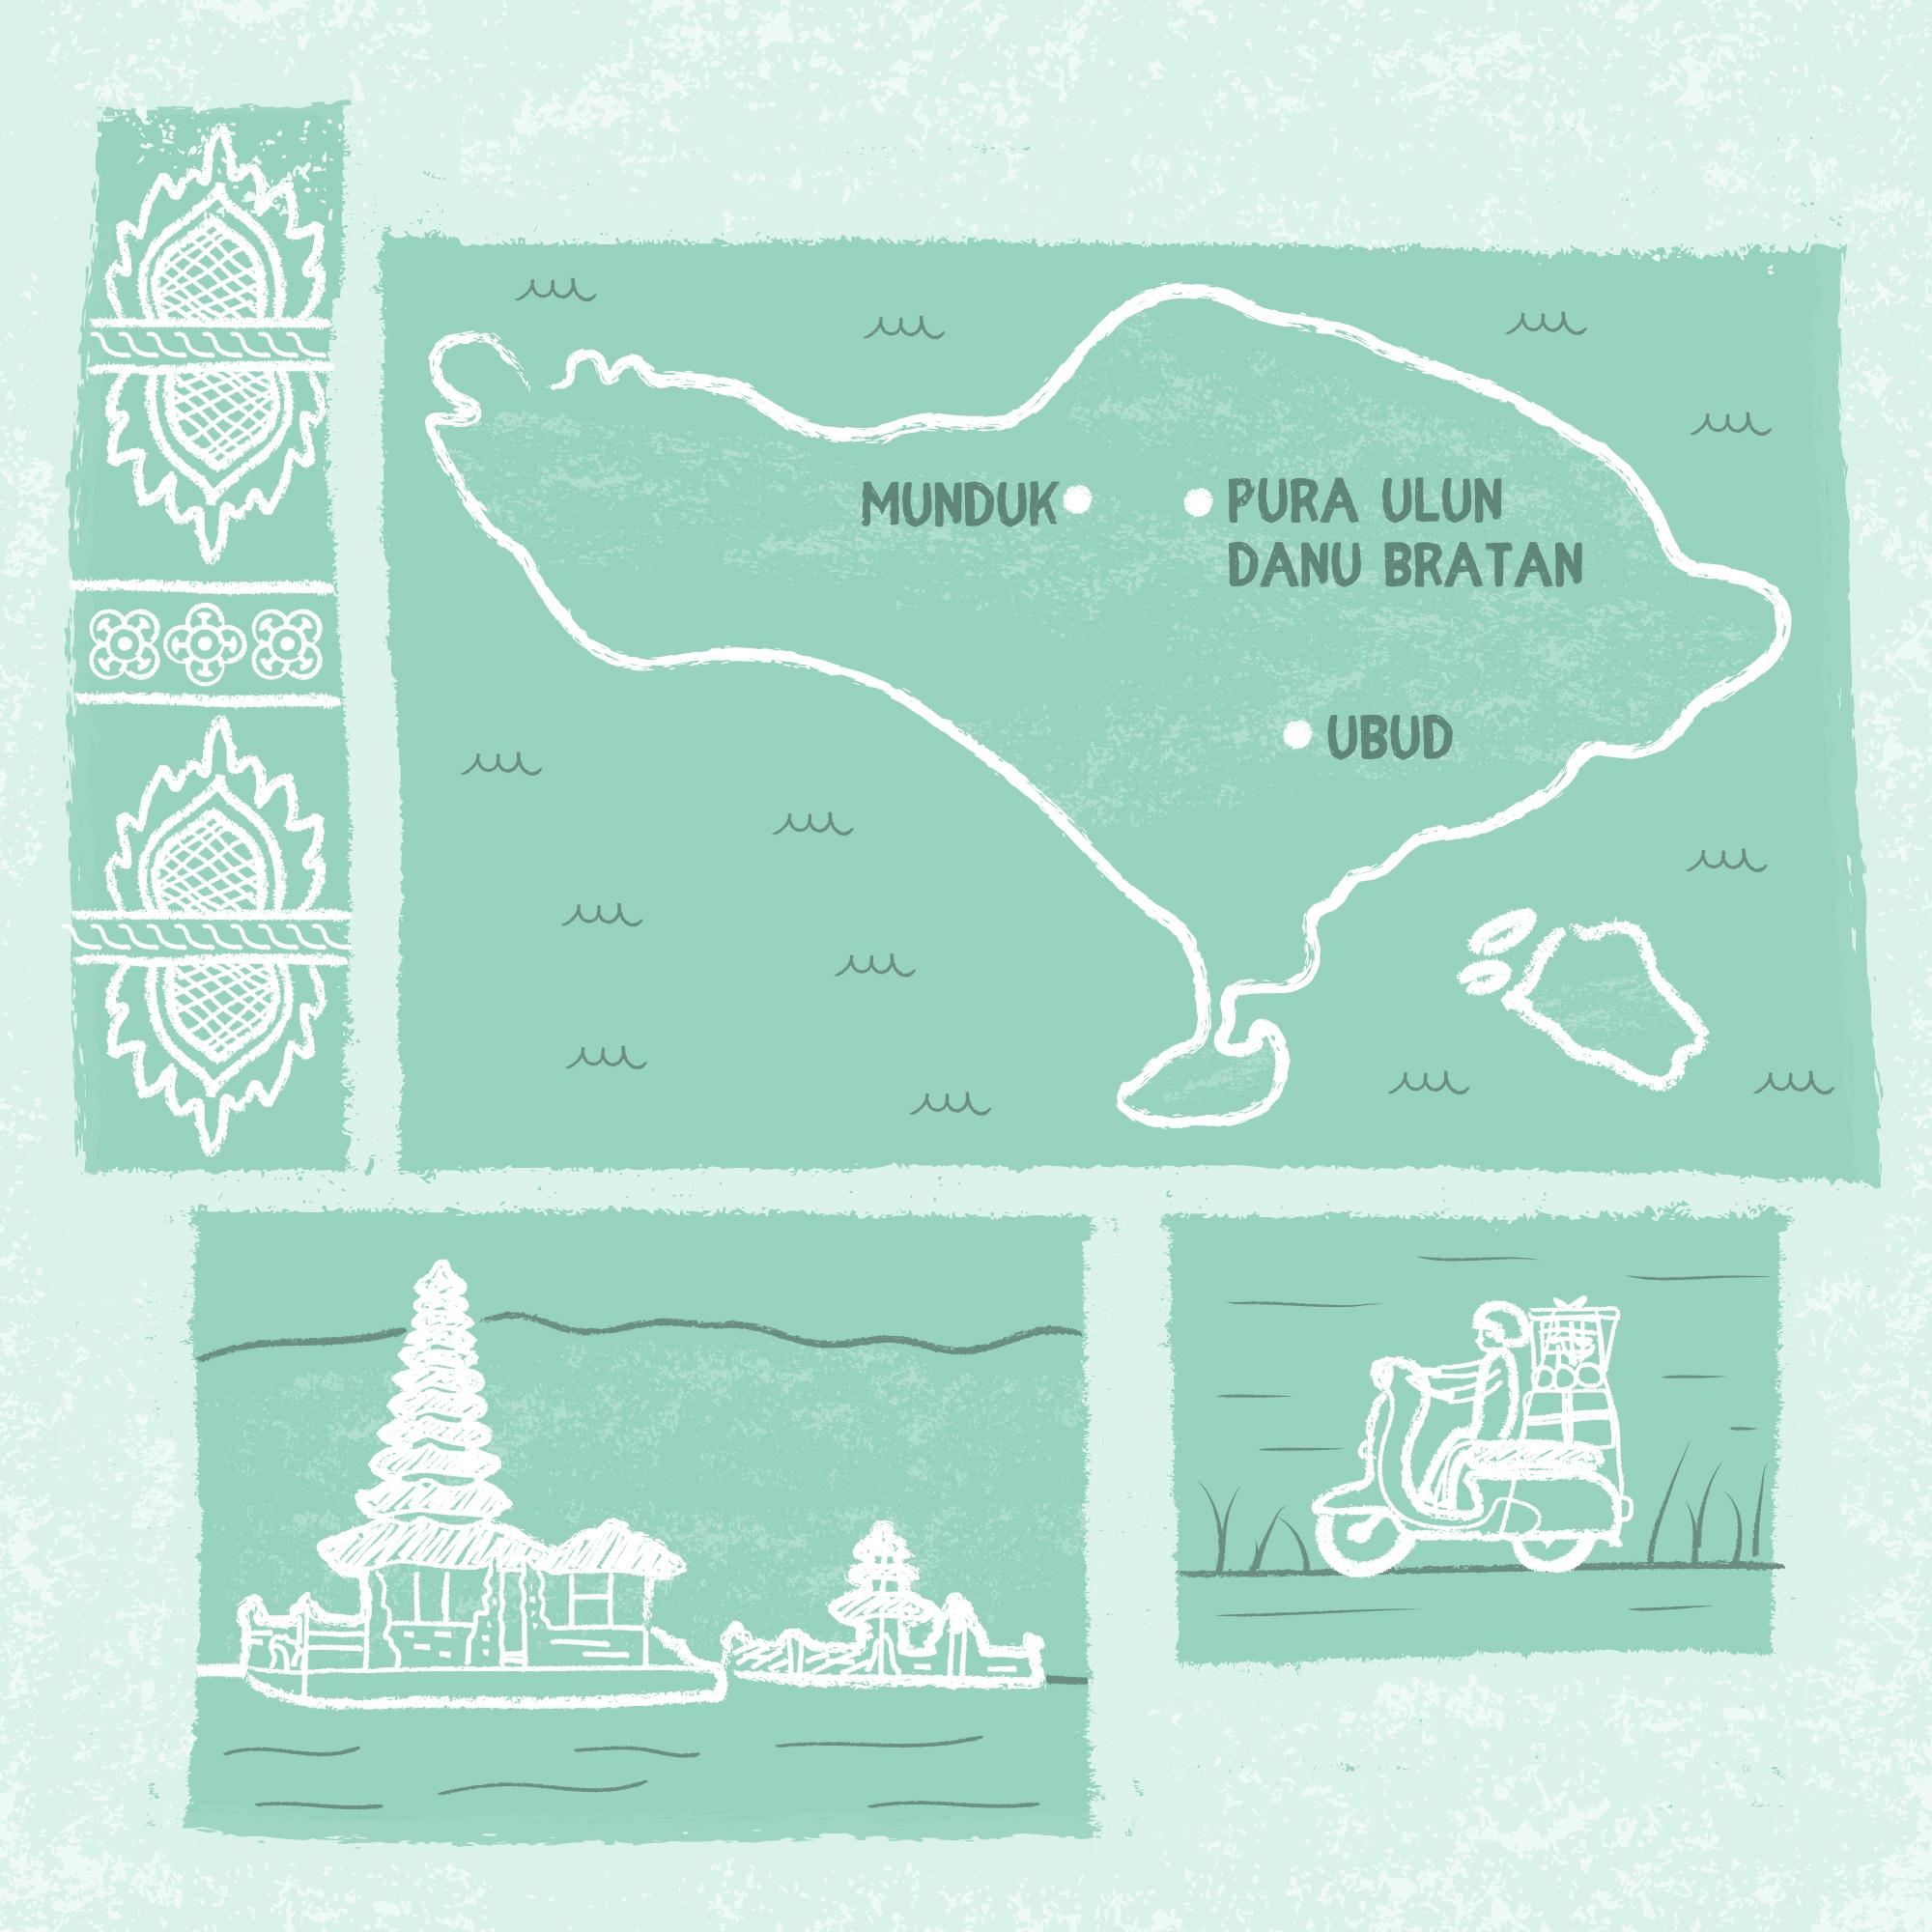 Bali travel illustration